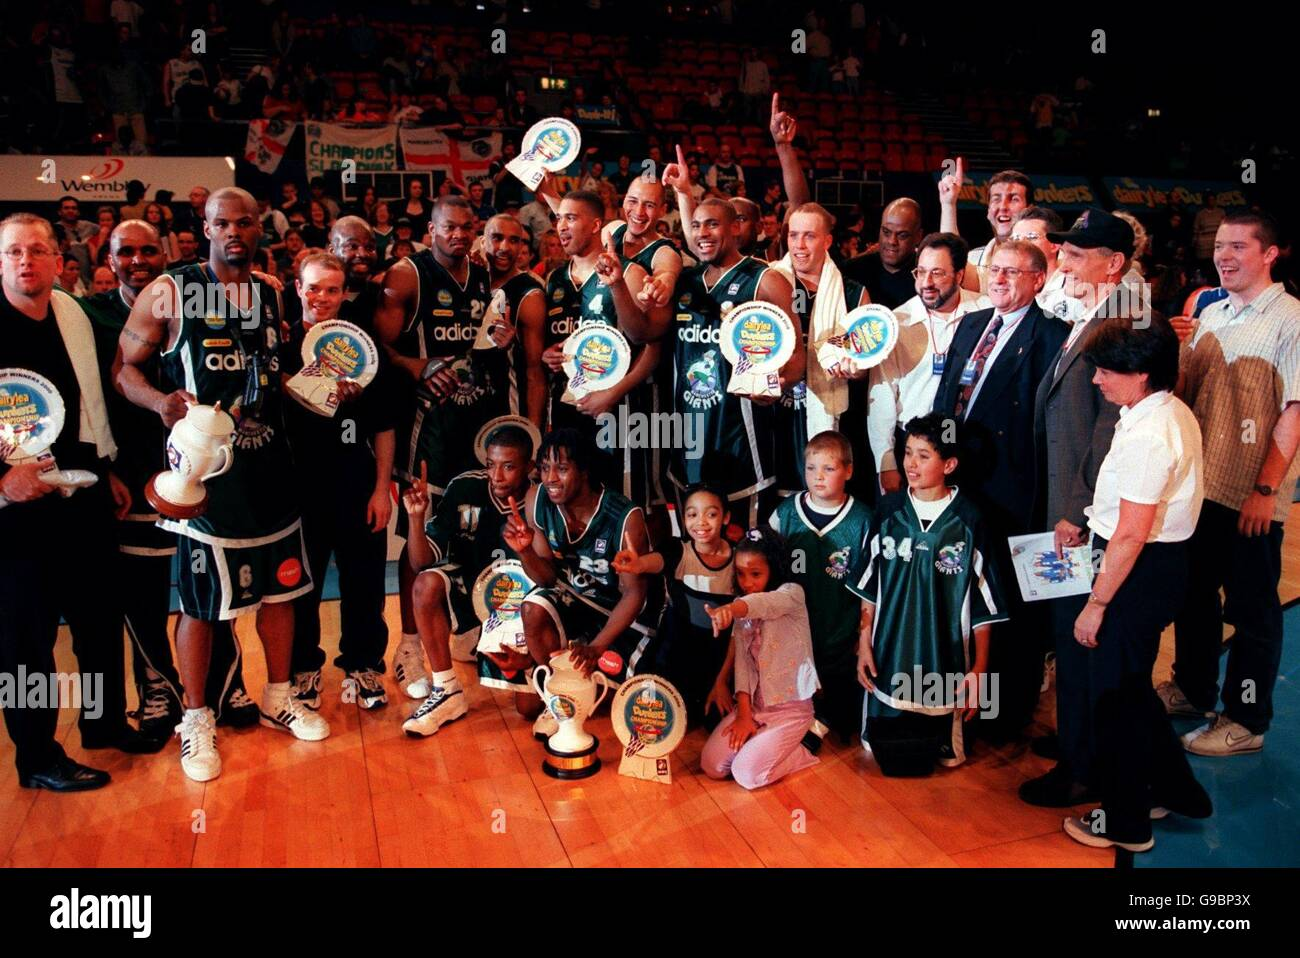 Basketball - Dairylea Dunkers Championship - Final - Manchester Giants v Birmingham Bullets - Stock Image